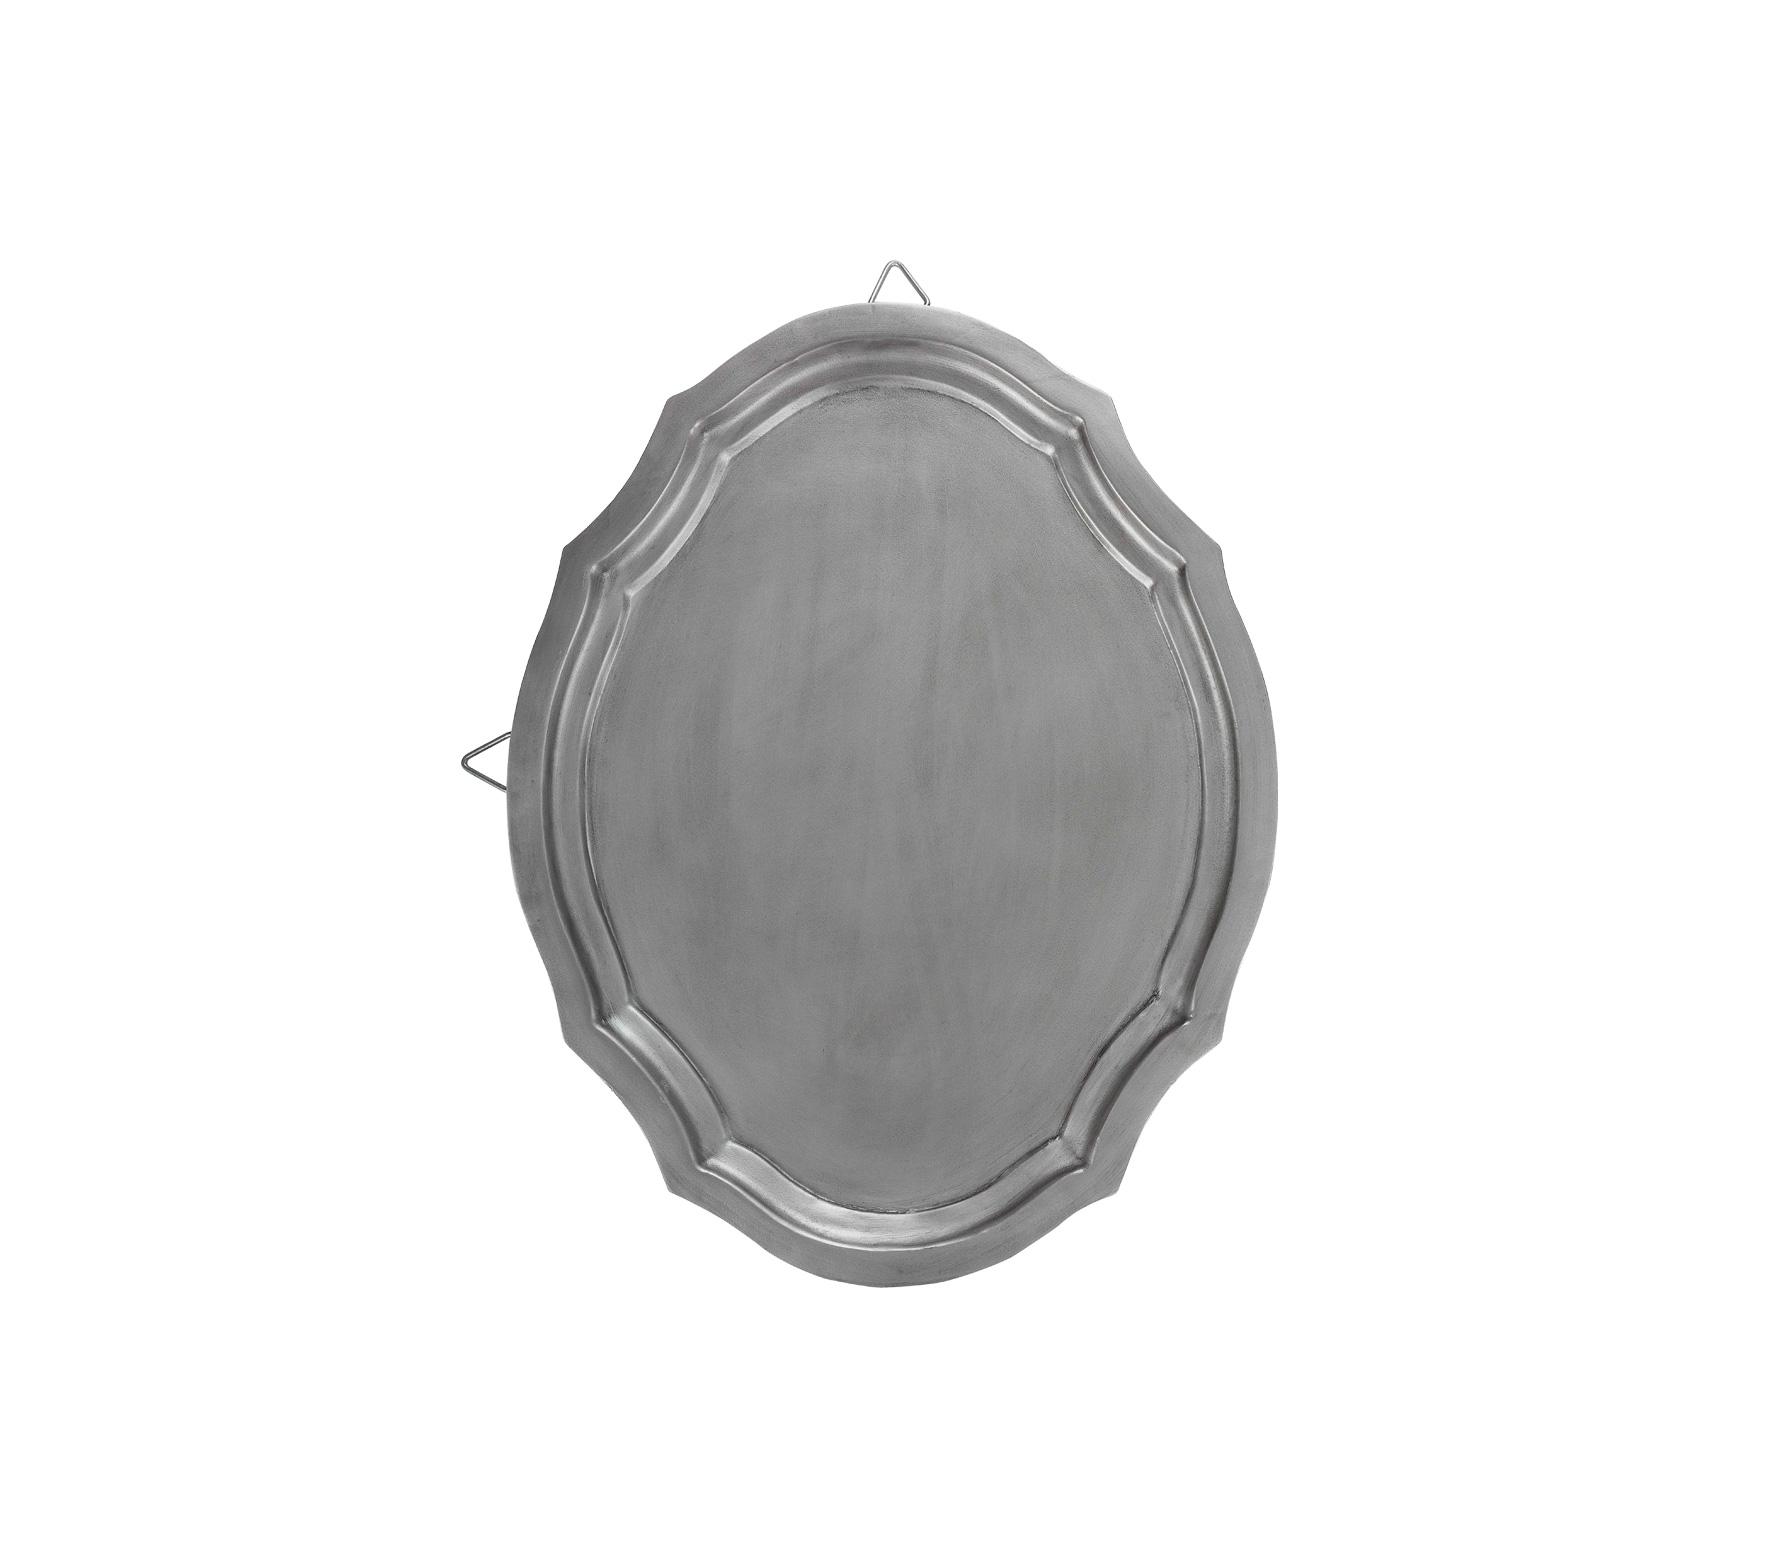 vtwonen Dienblad ovaal 52x40 cm antique zilver finish